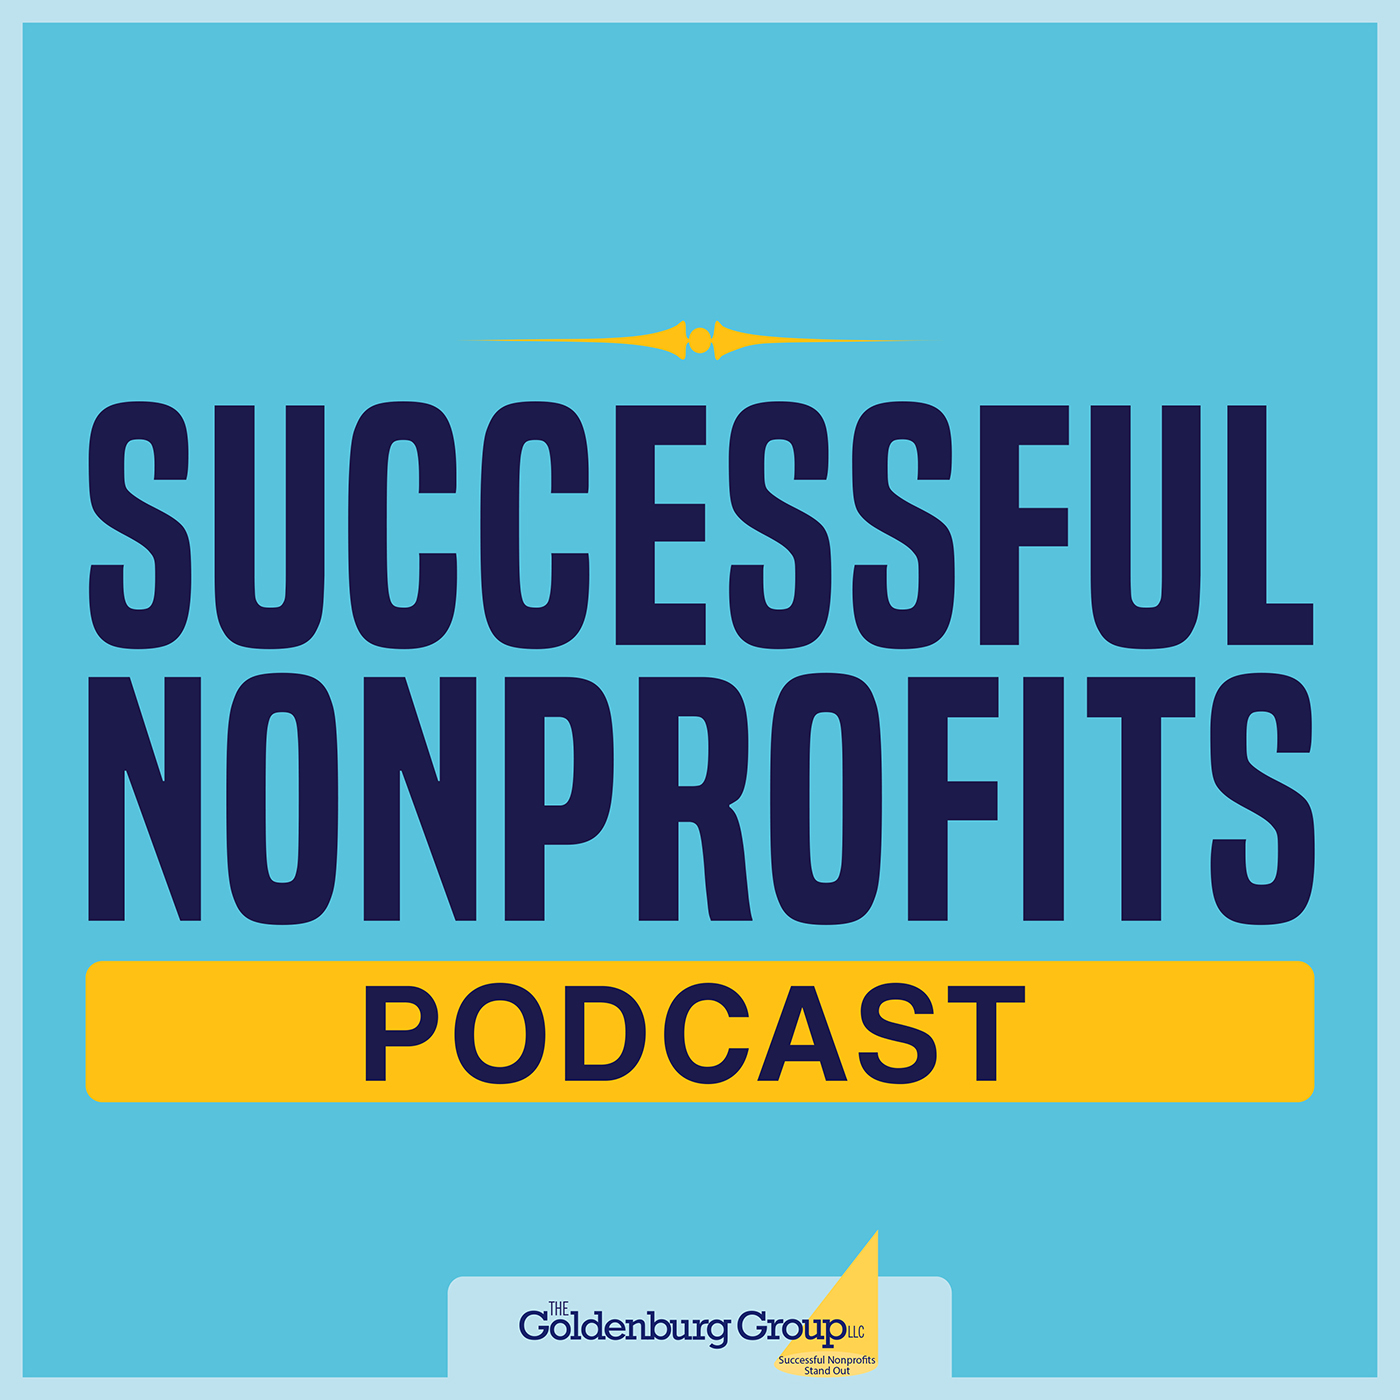 Successful Nonprofits Podcast show art